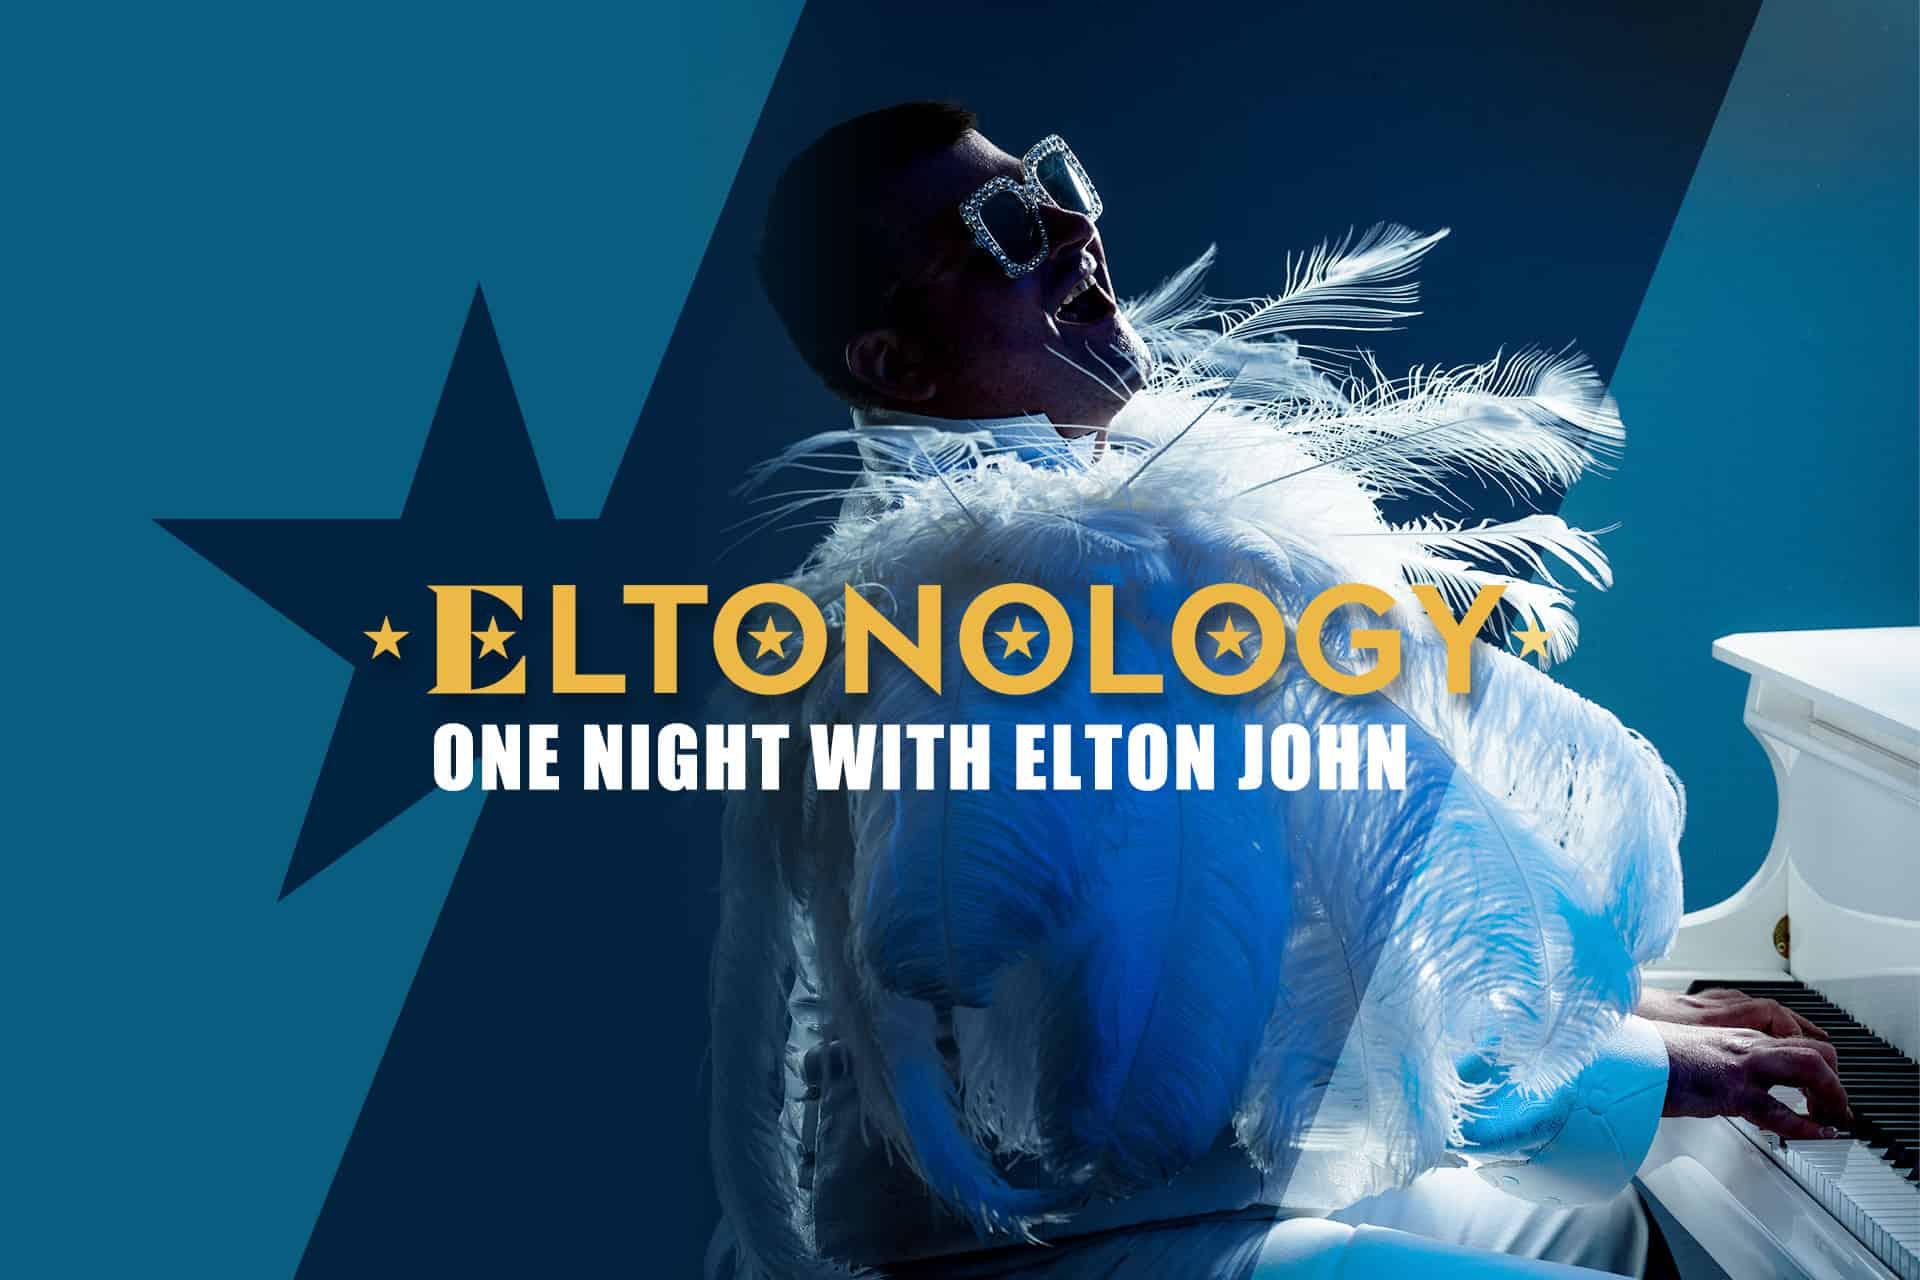 NEW SHOW : ONE NIGHT WITH ELTON JOHN